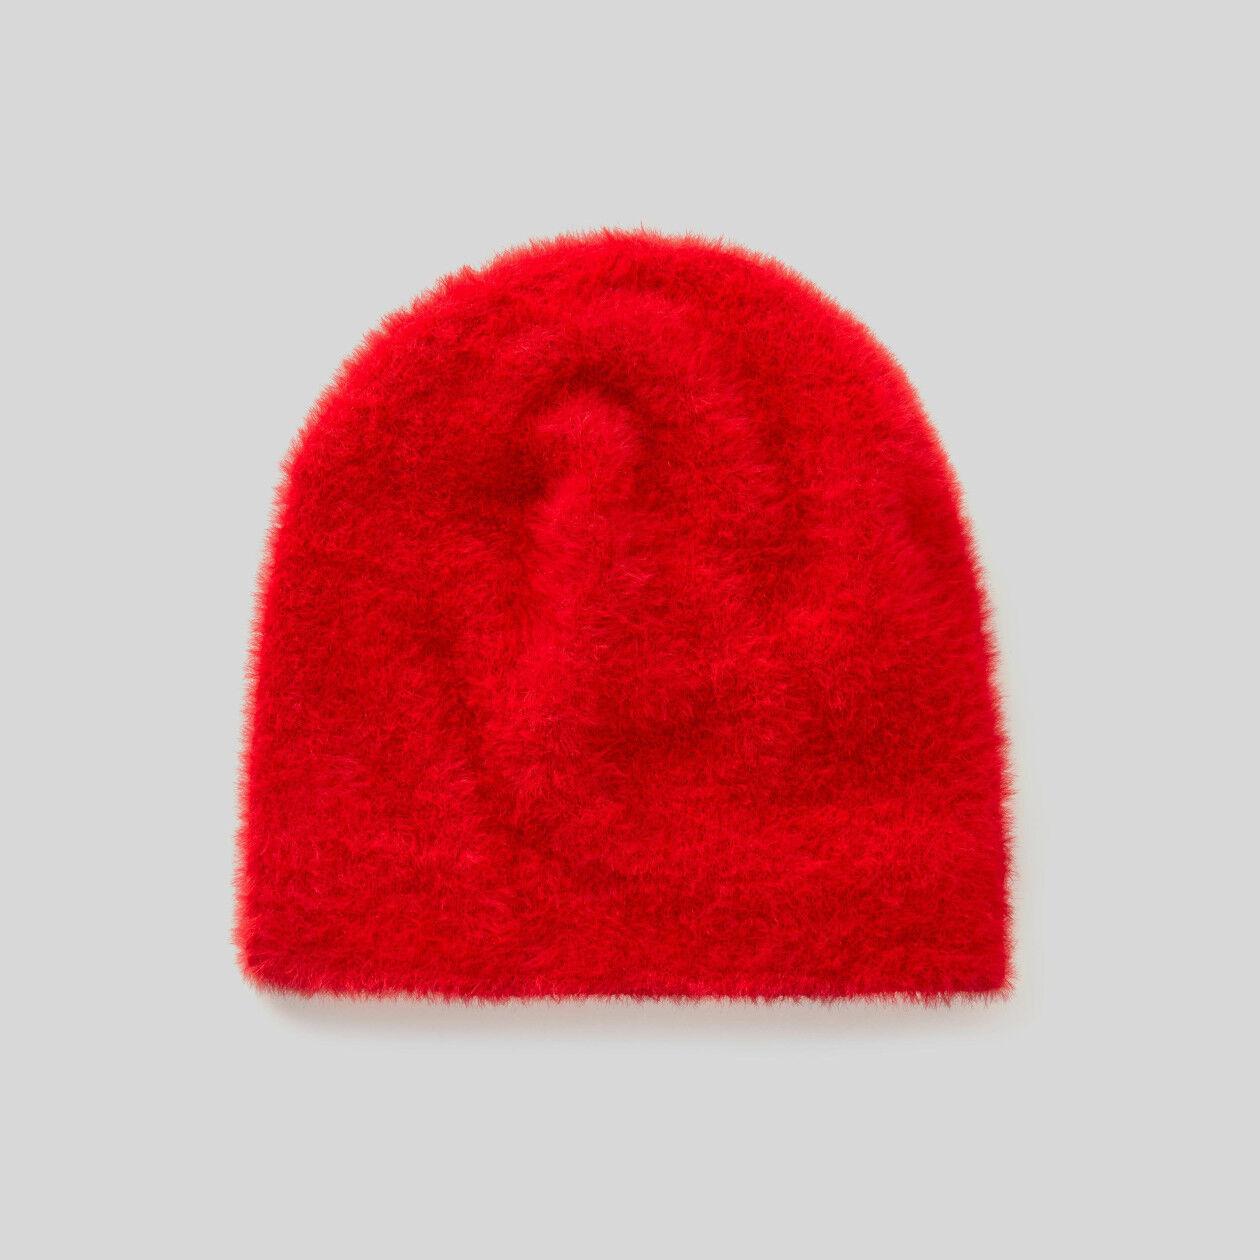 Hat in long-haired yarn